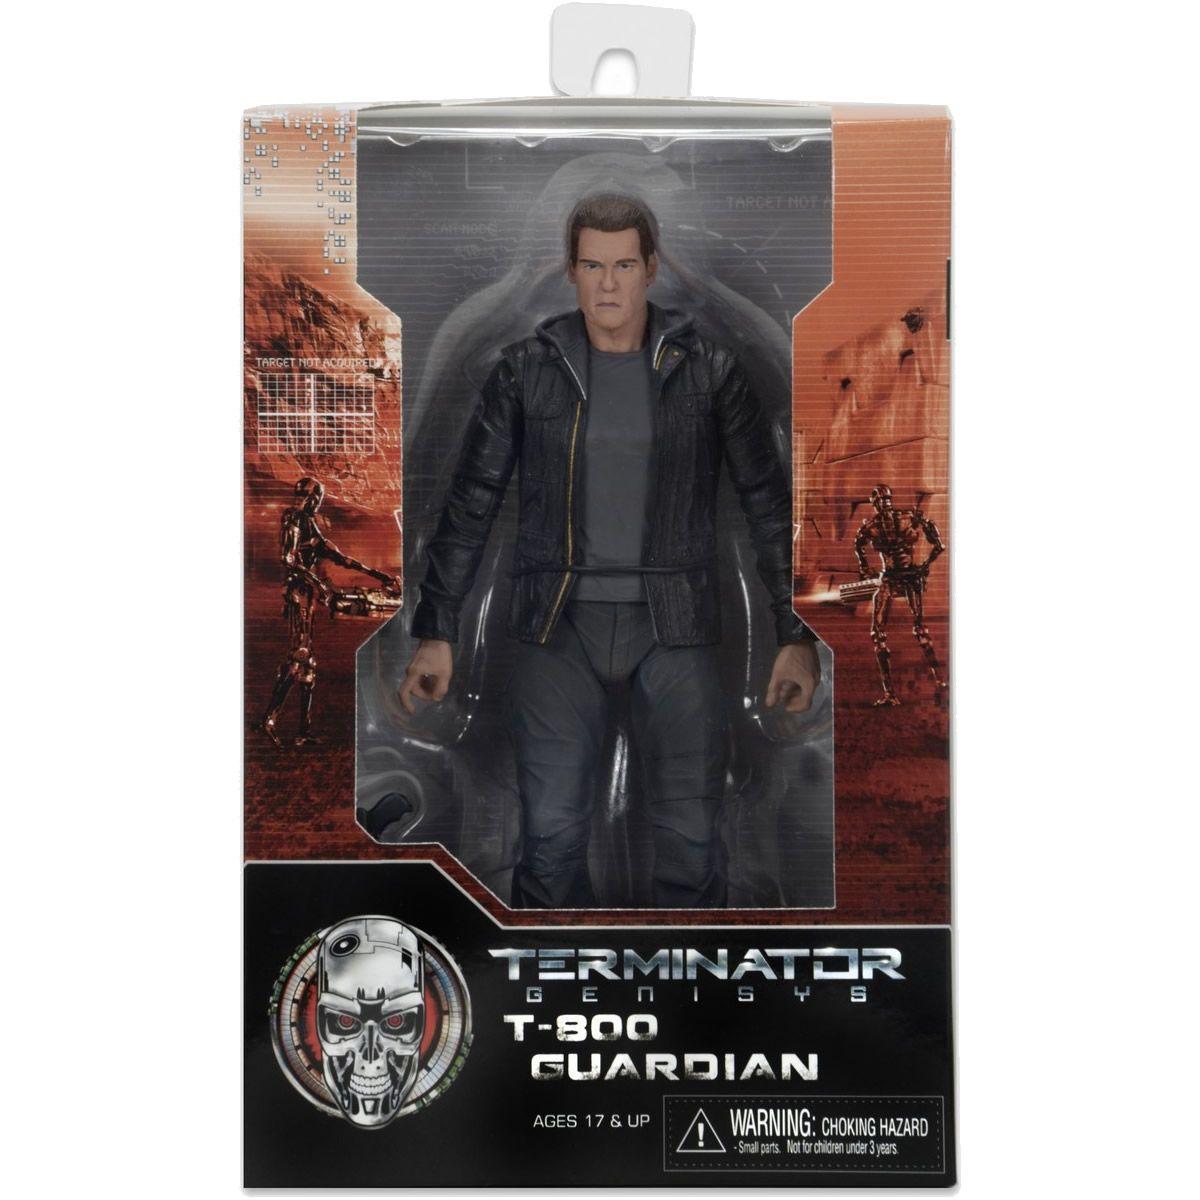 Exterminador Do Futuro Guardian T-800 - Terminator Genisys - Series 1 - NECA